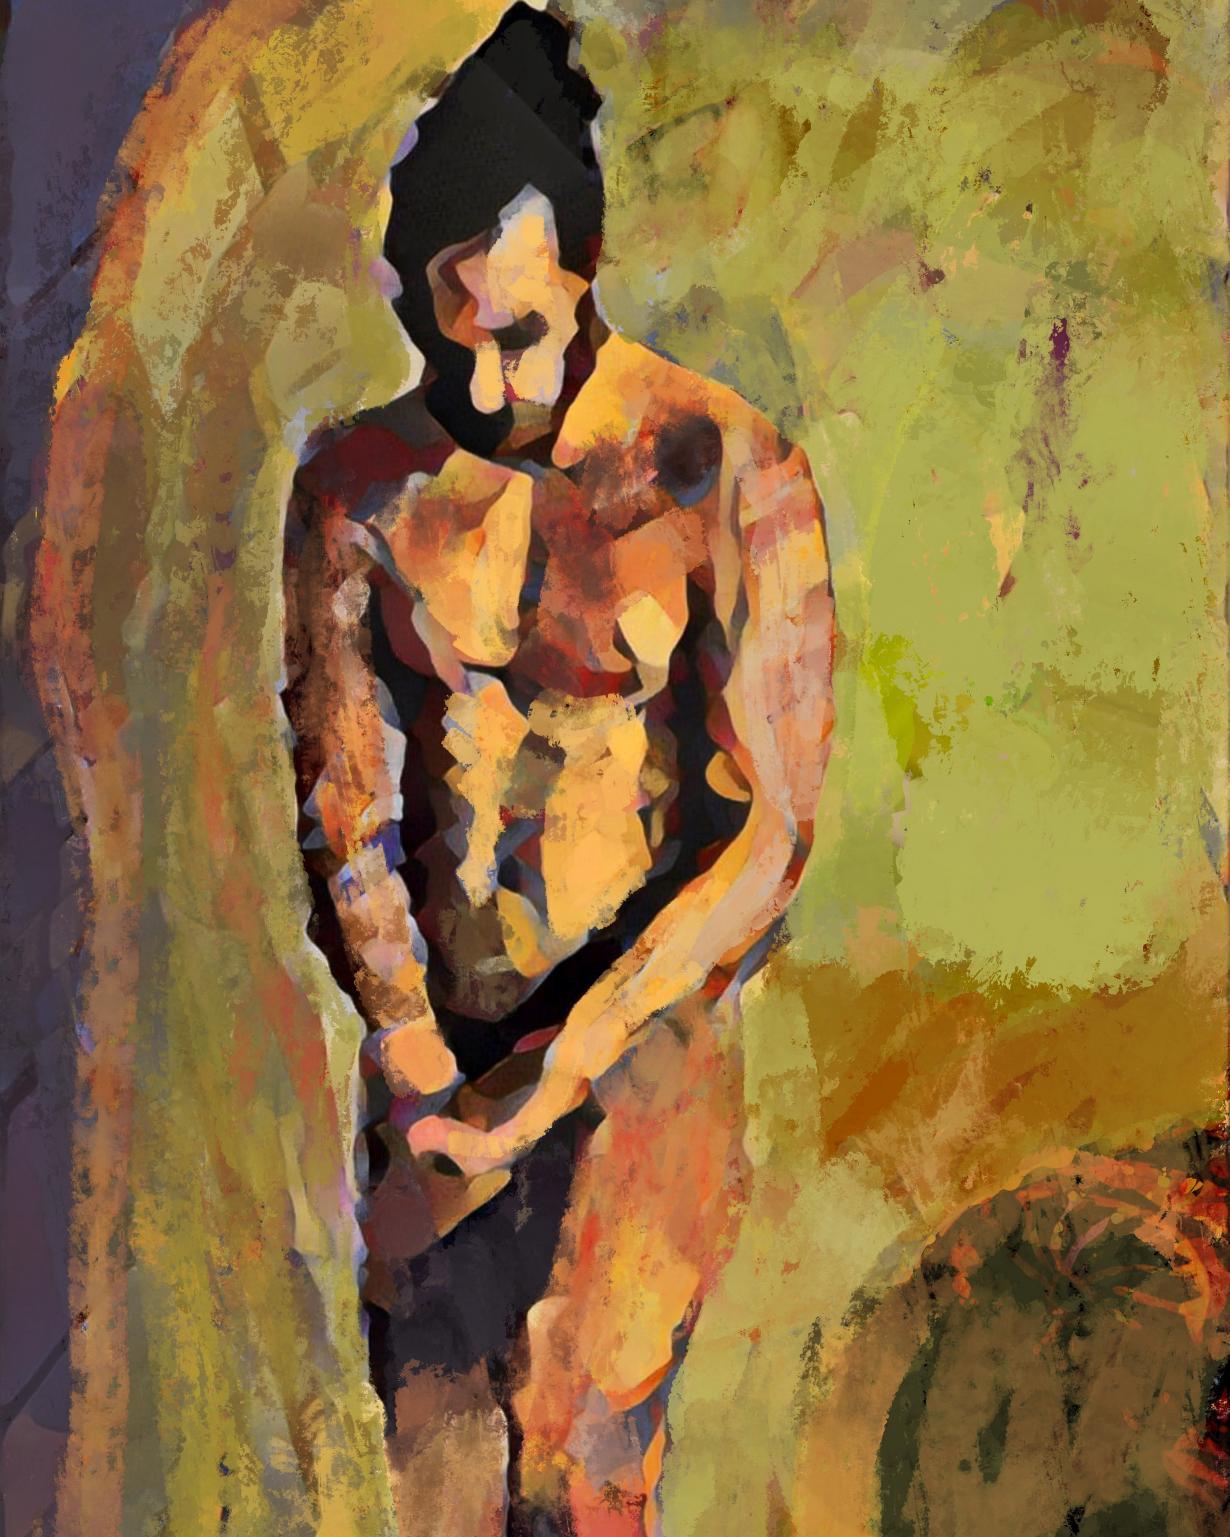 Hombre reflexivo (2020) - Soledad Fernandez Fernandez